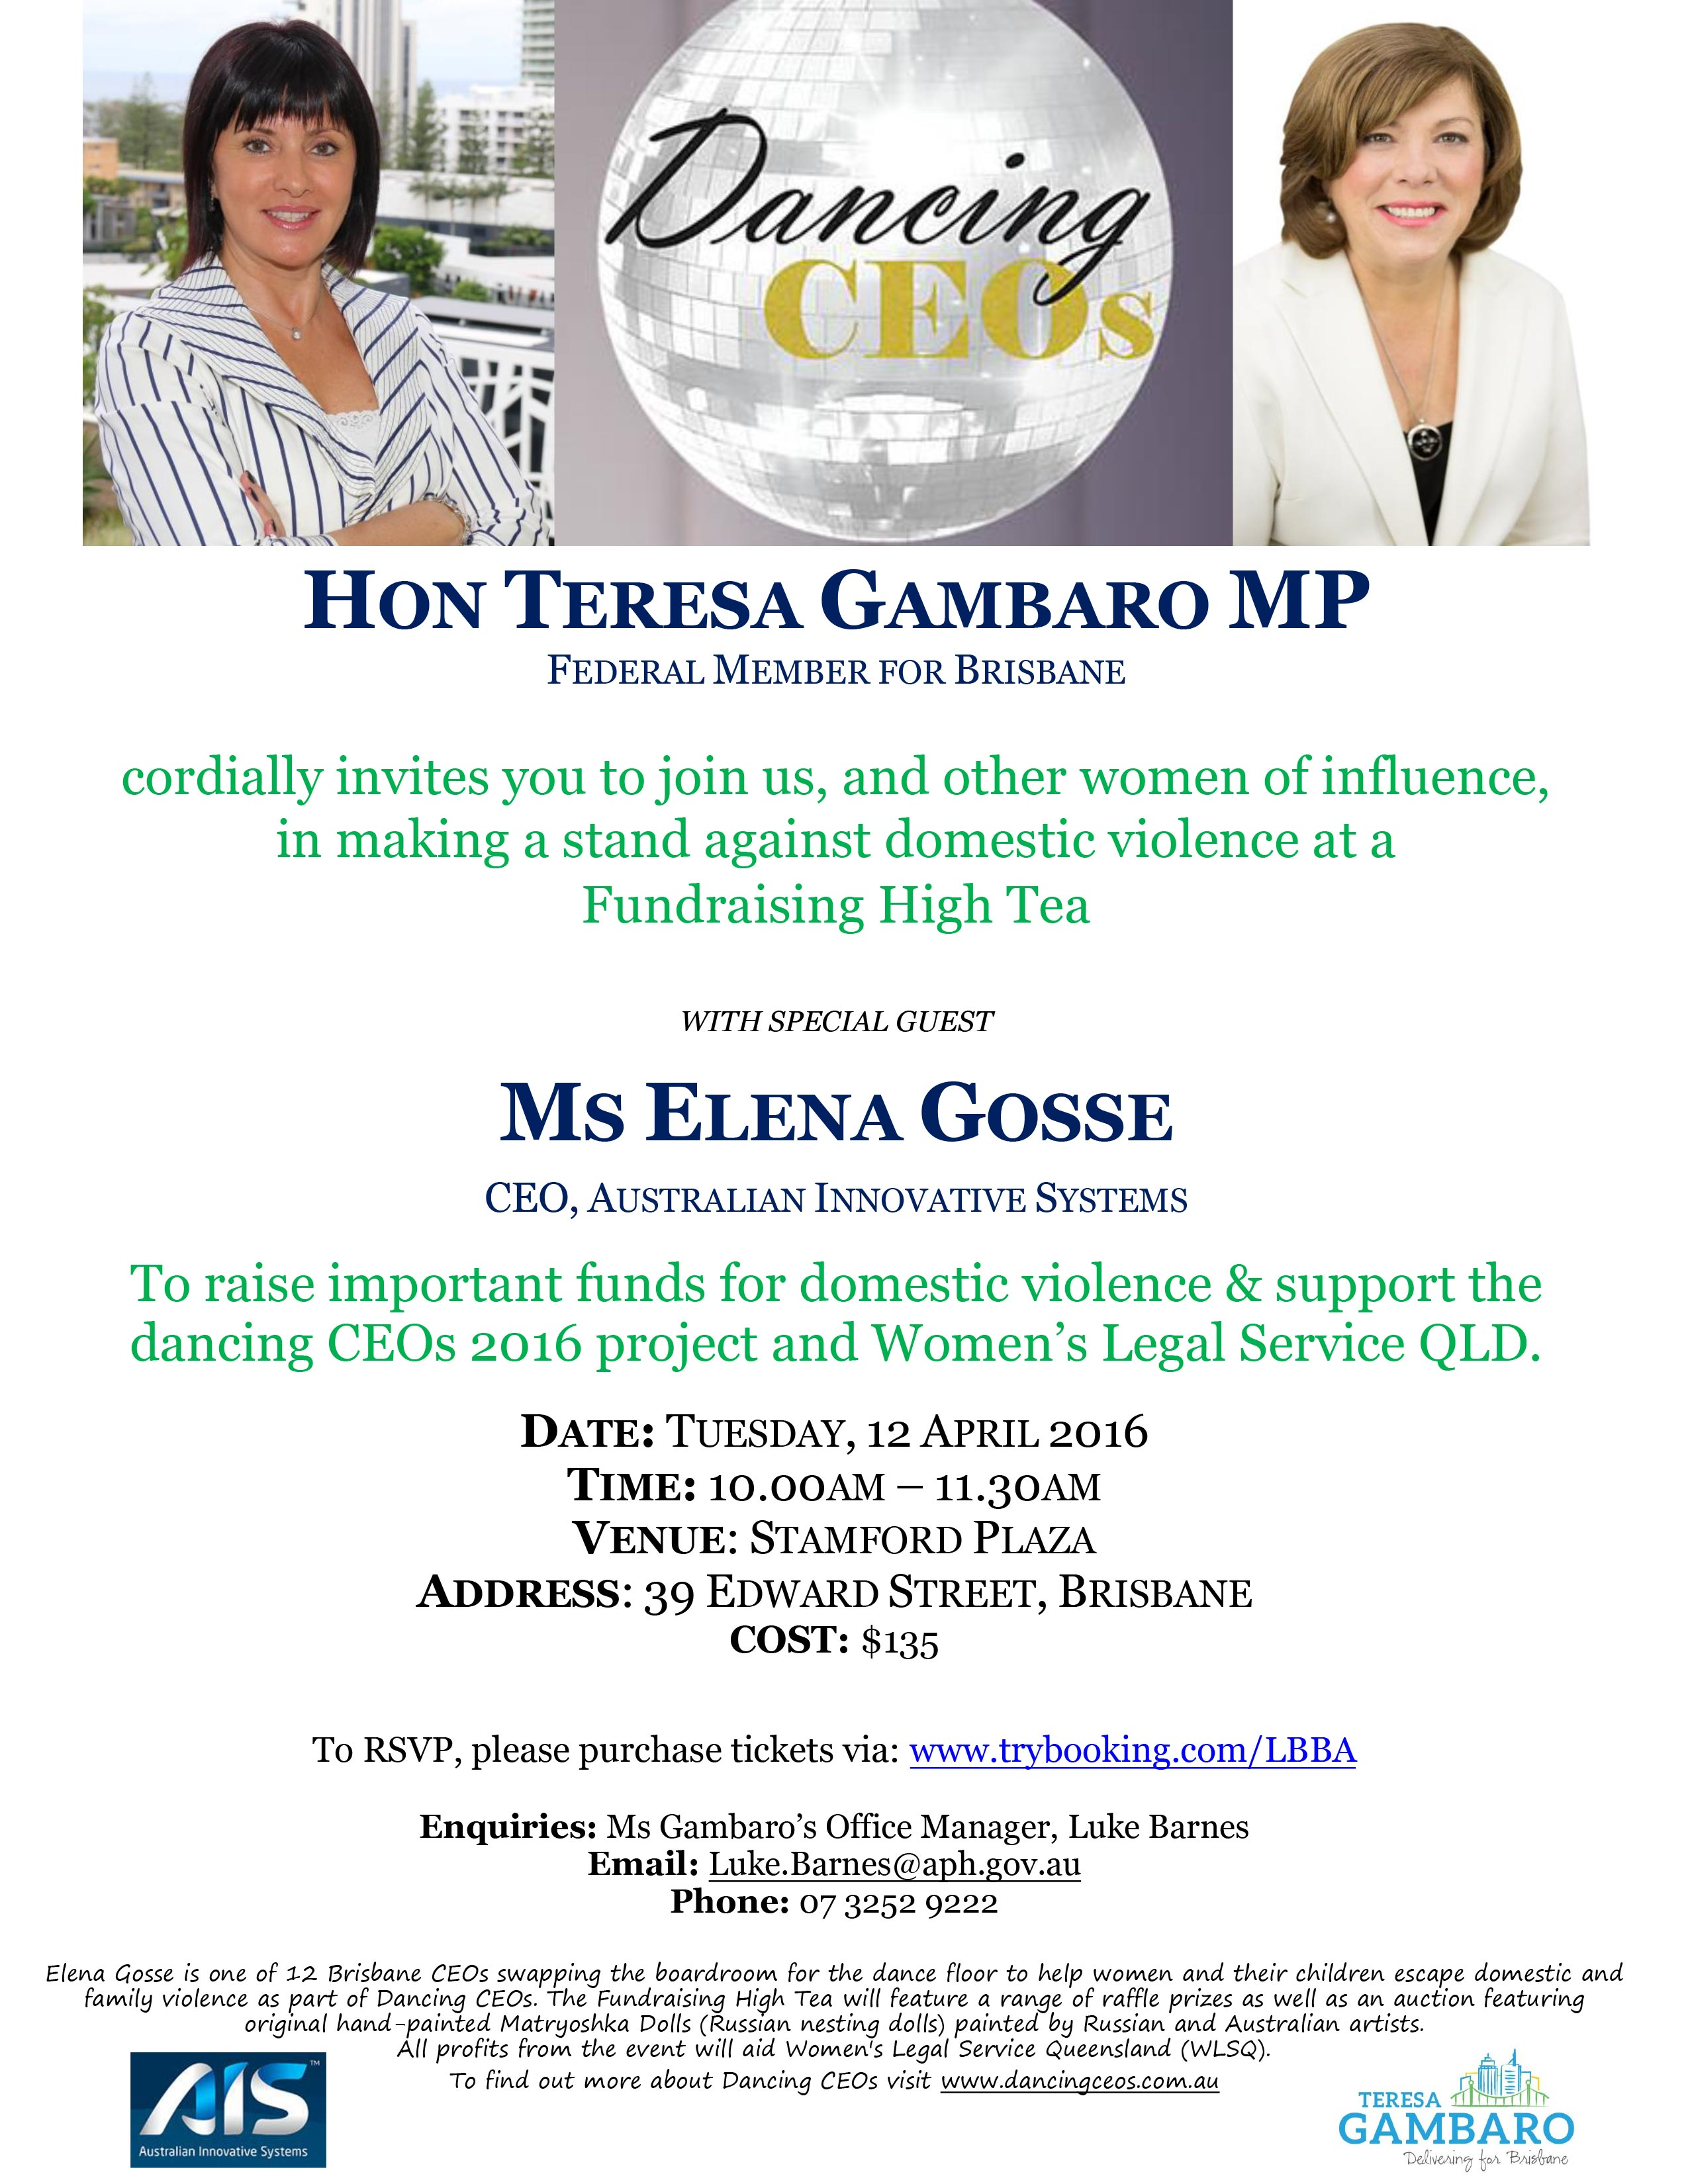 Dancing-CEOs-Morning-Tea-Invite_Elena-Gosse_AIS